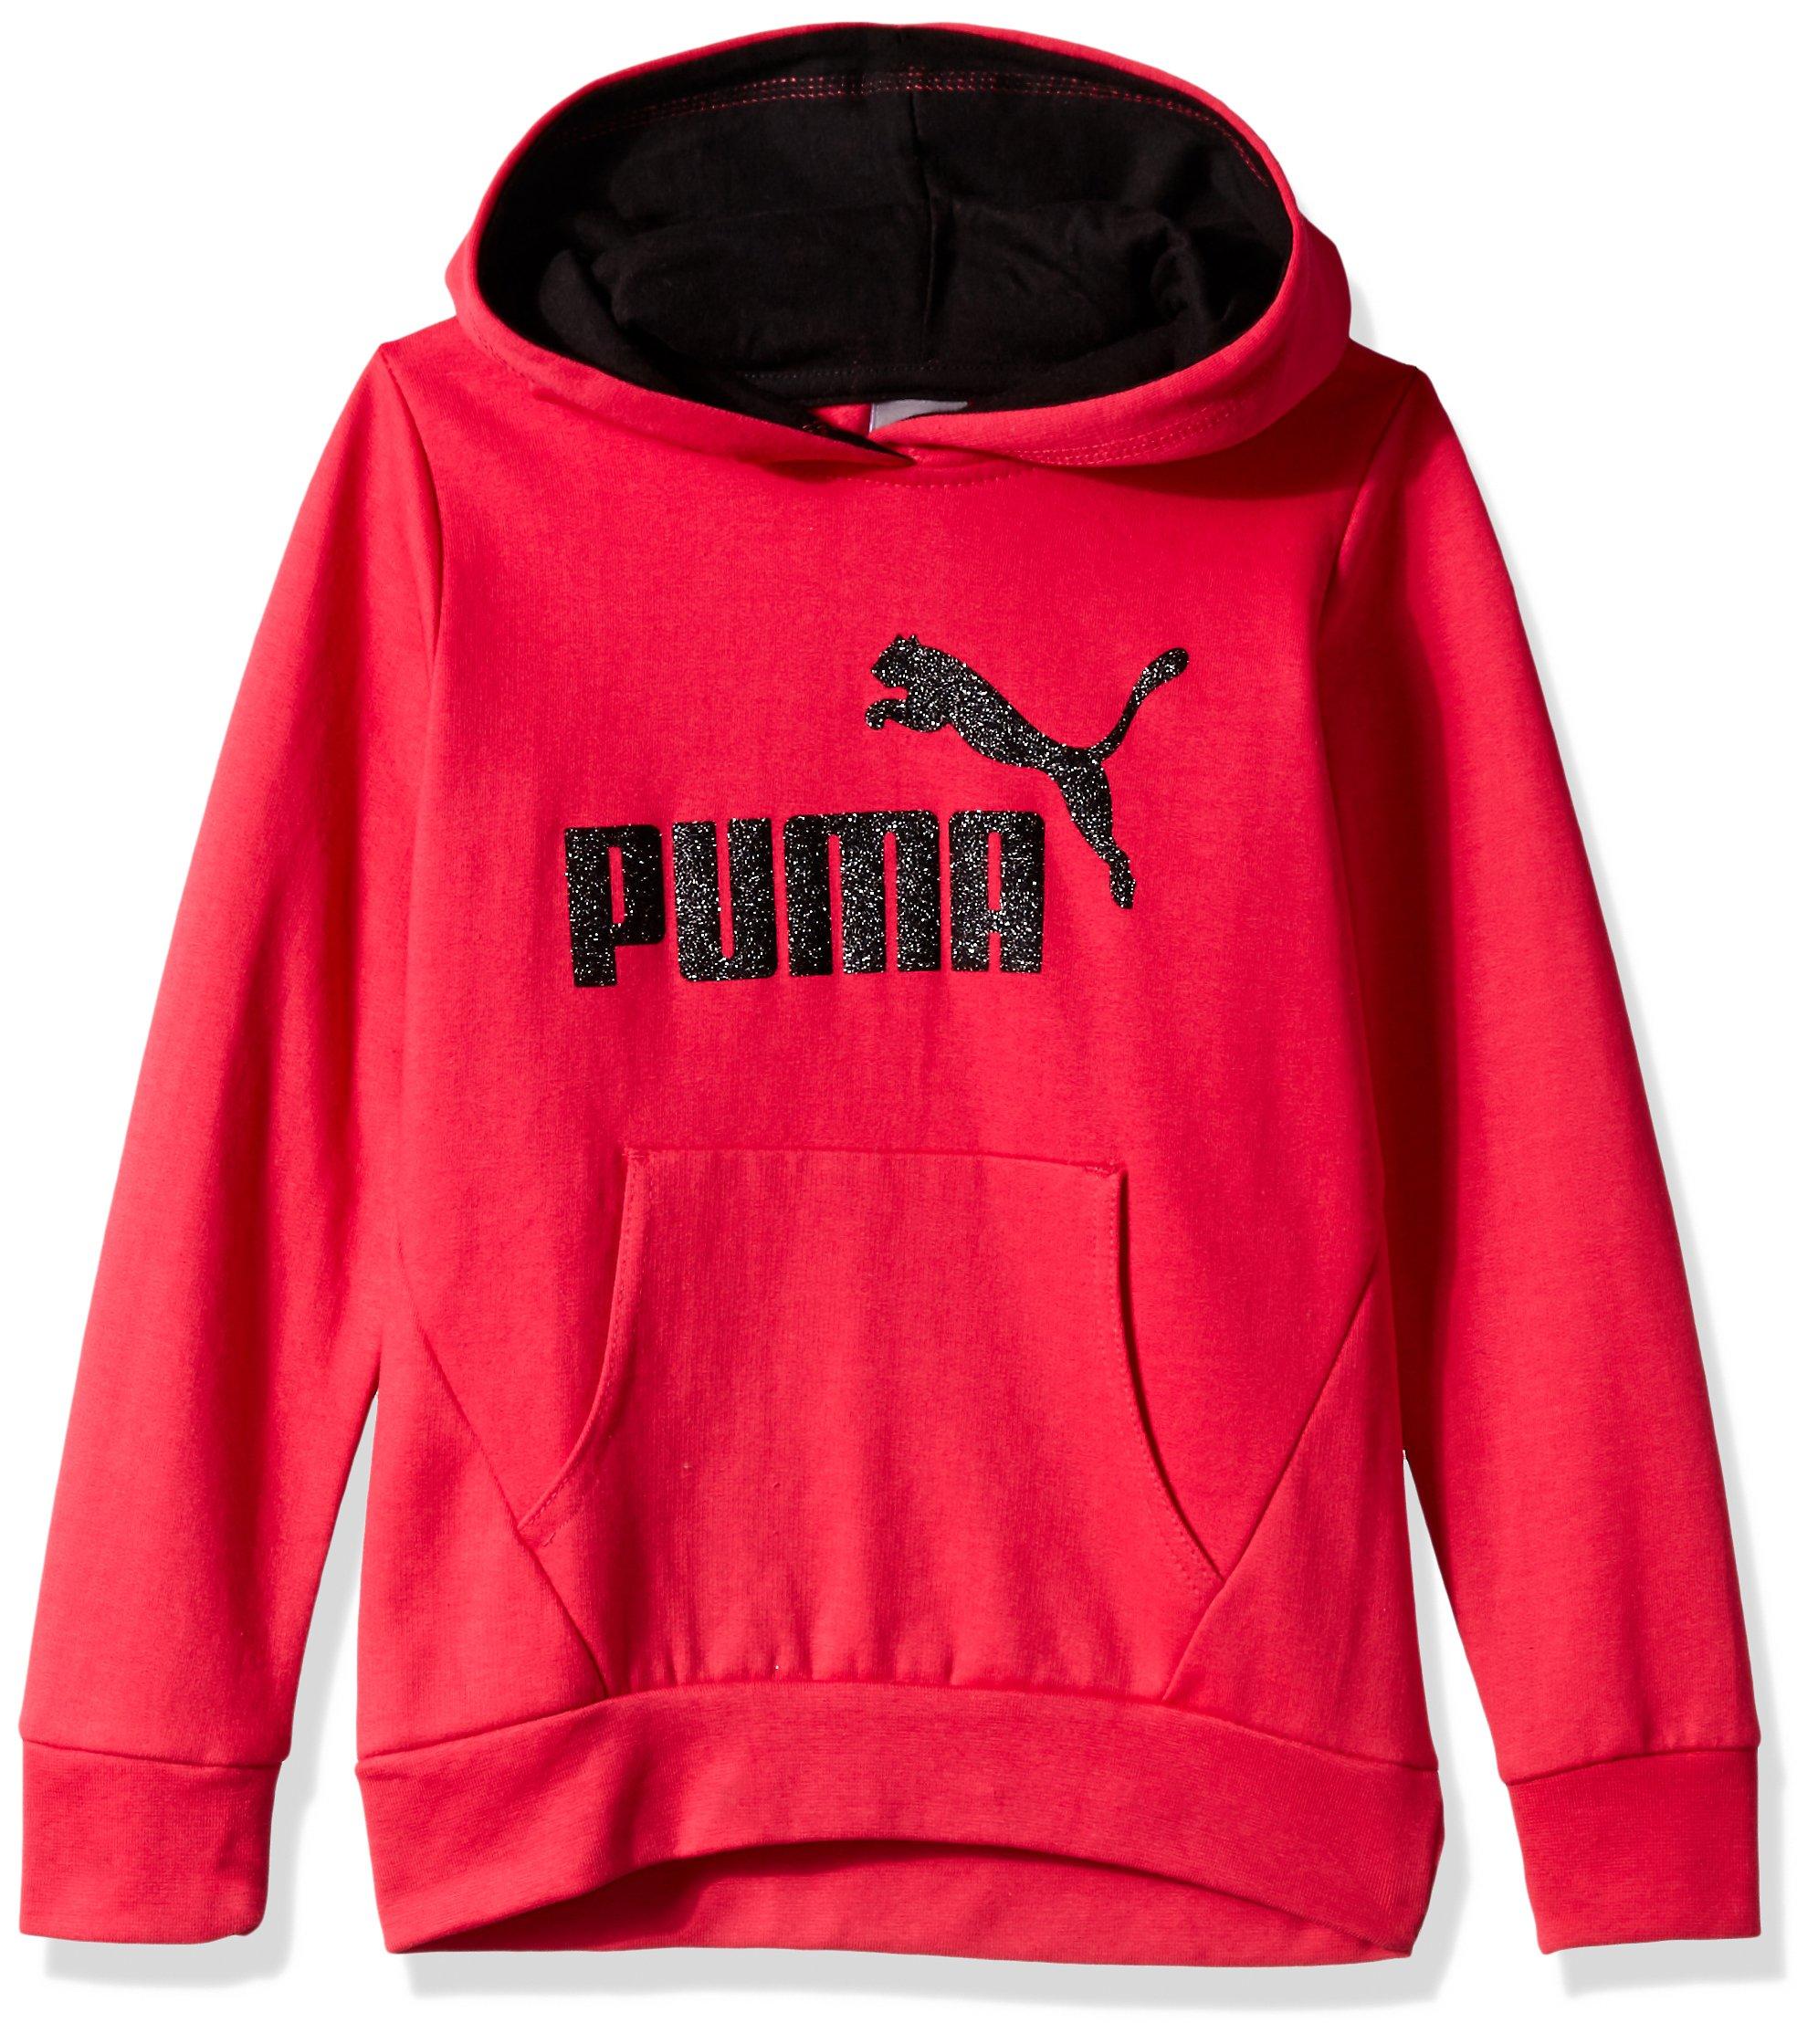 PUMA Big Girls' Hoodie, Love Potion, Medium (8/10)